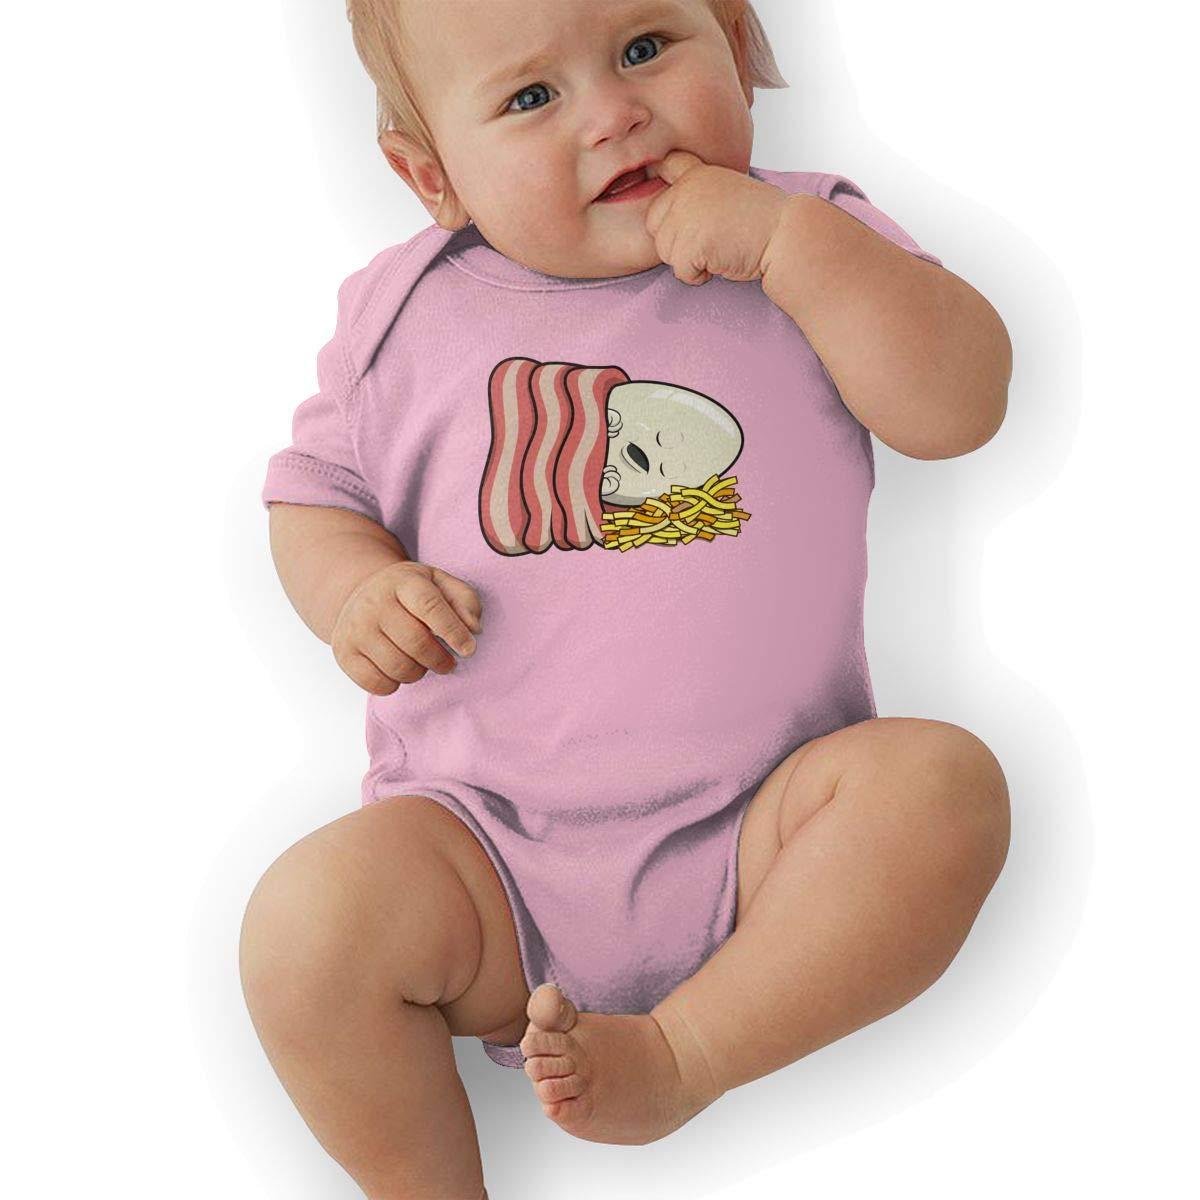 Newborn Baby Boys Bodysuit Short-Sleeve Onesie Eggs and Bacon Print Jumpsuit Summer Pajamas